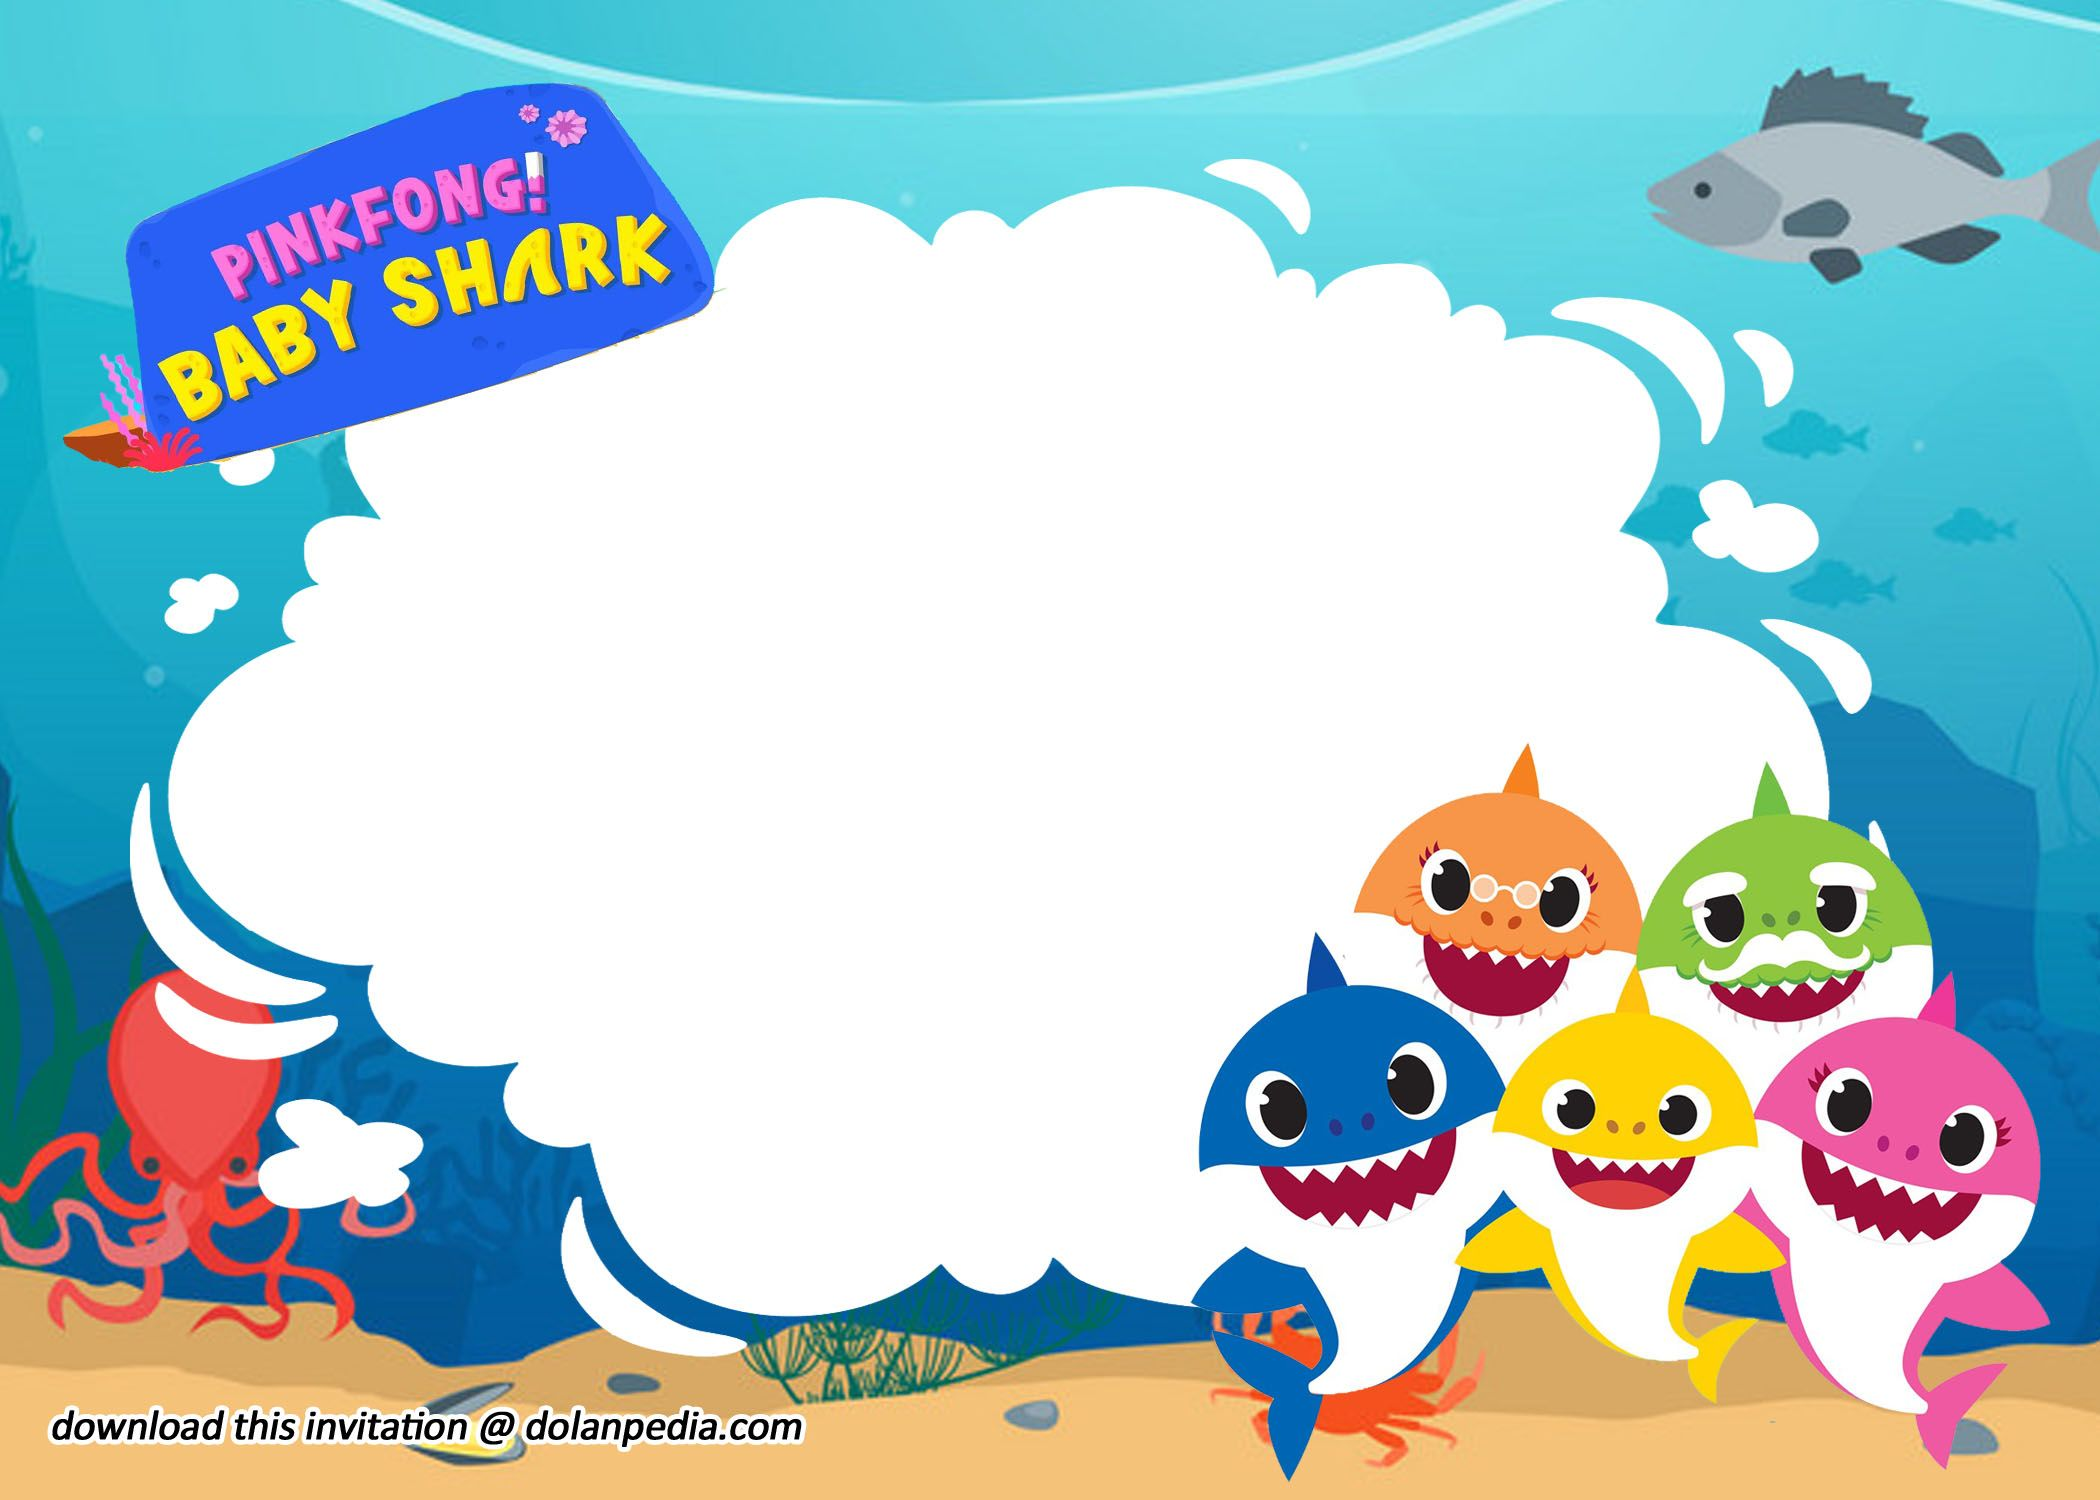 Free Printable Baby Shark Invitation Birthday Templates Birthday Template Birthday Invitations Free Printable Invitations Templates